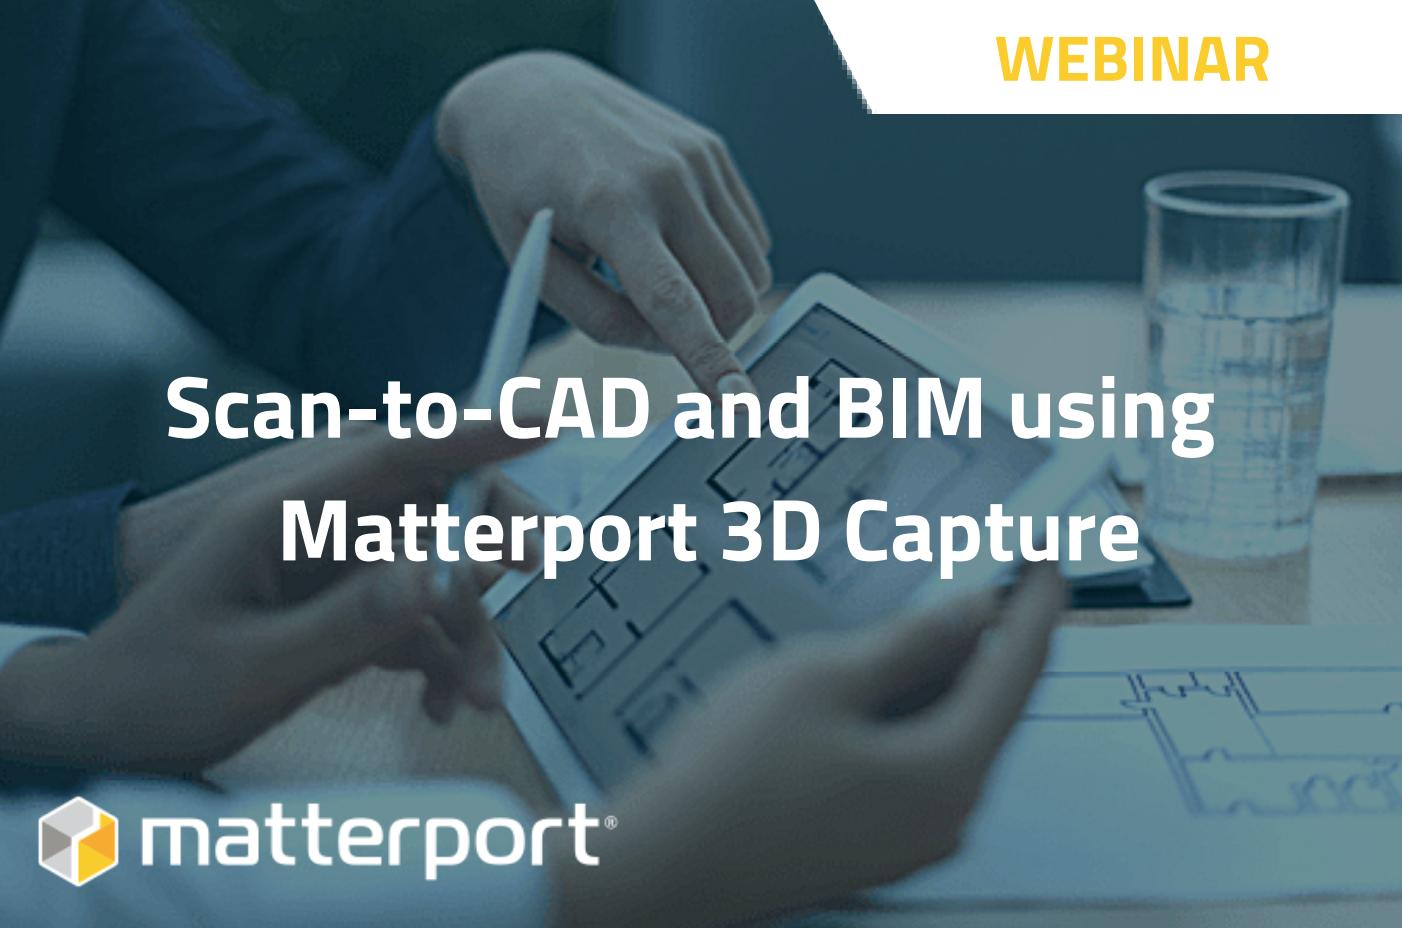 [On-Demand Webinar] Scan-to-CAD & BIM